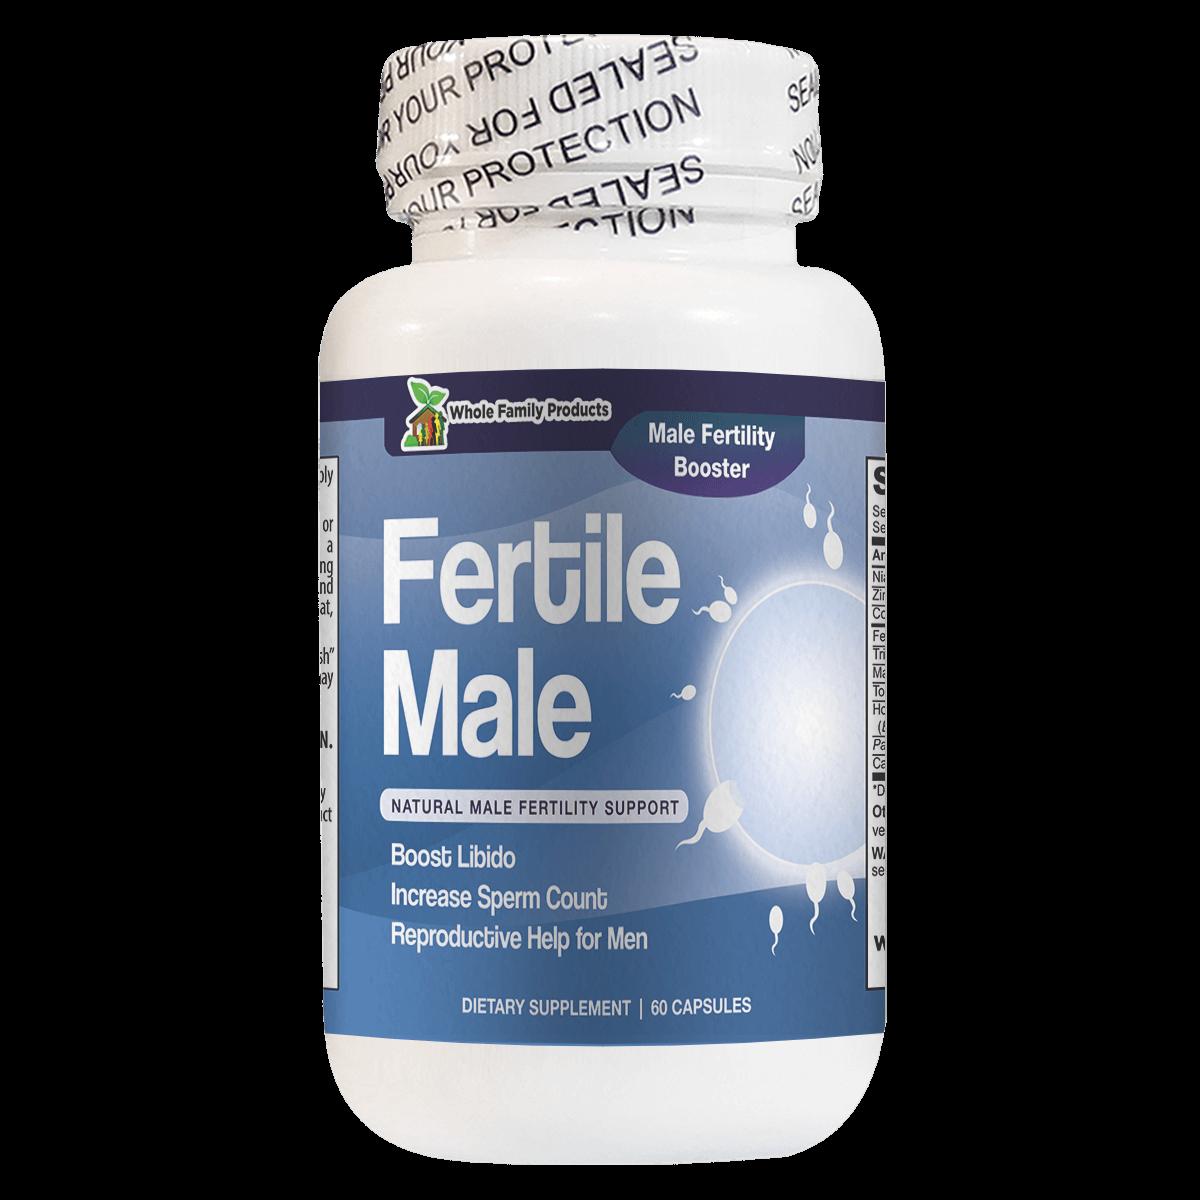 Fertile Male Natural Male Fertility Support Boost Libido